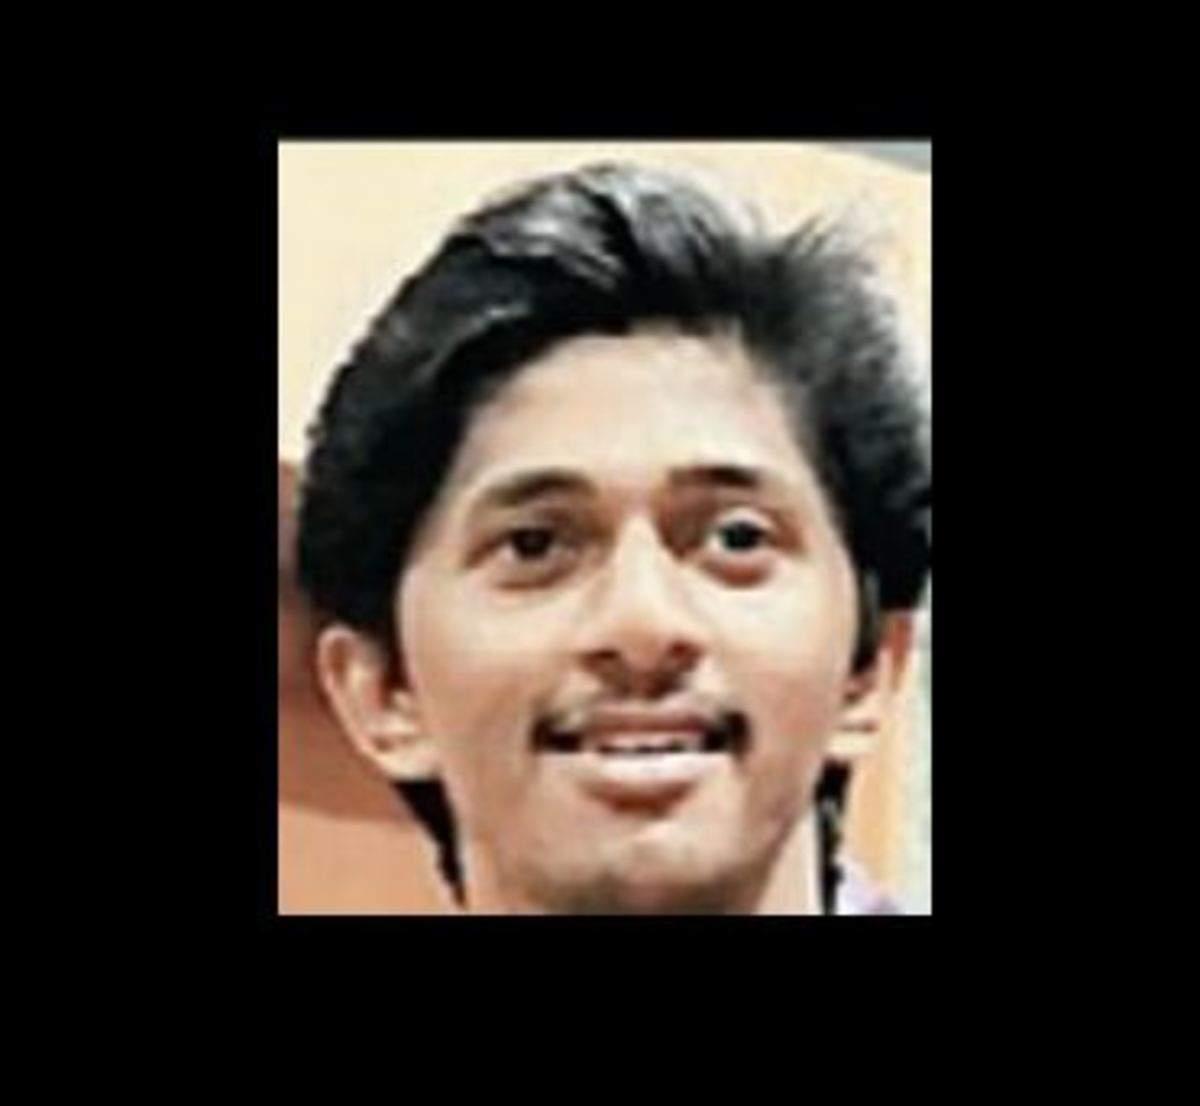 40235a48f20 iPhone: Kerala youth cracks 'secure' Apple lock | Kochi News - Times ...